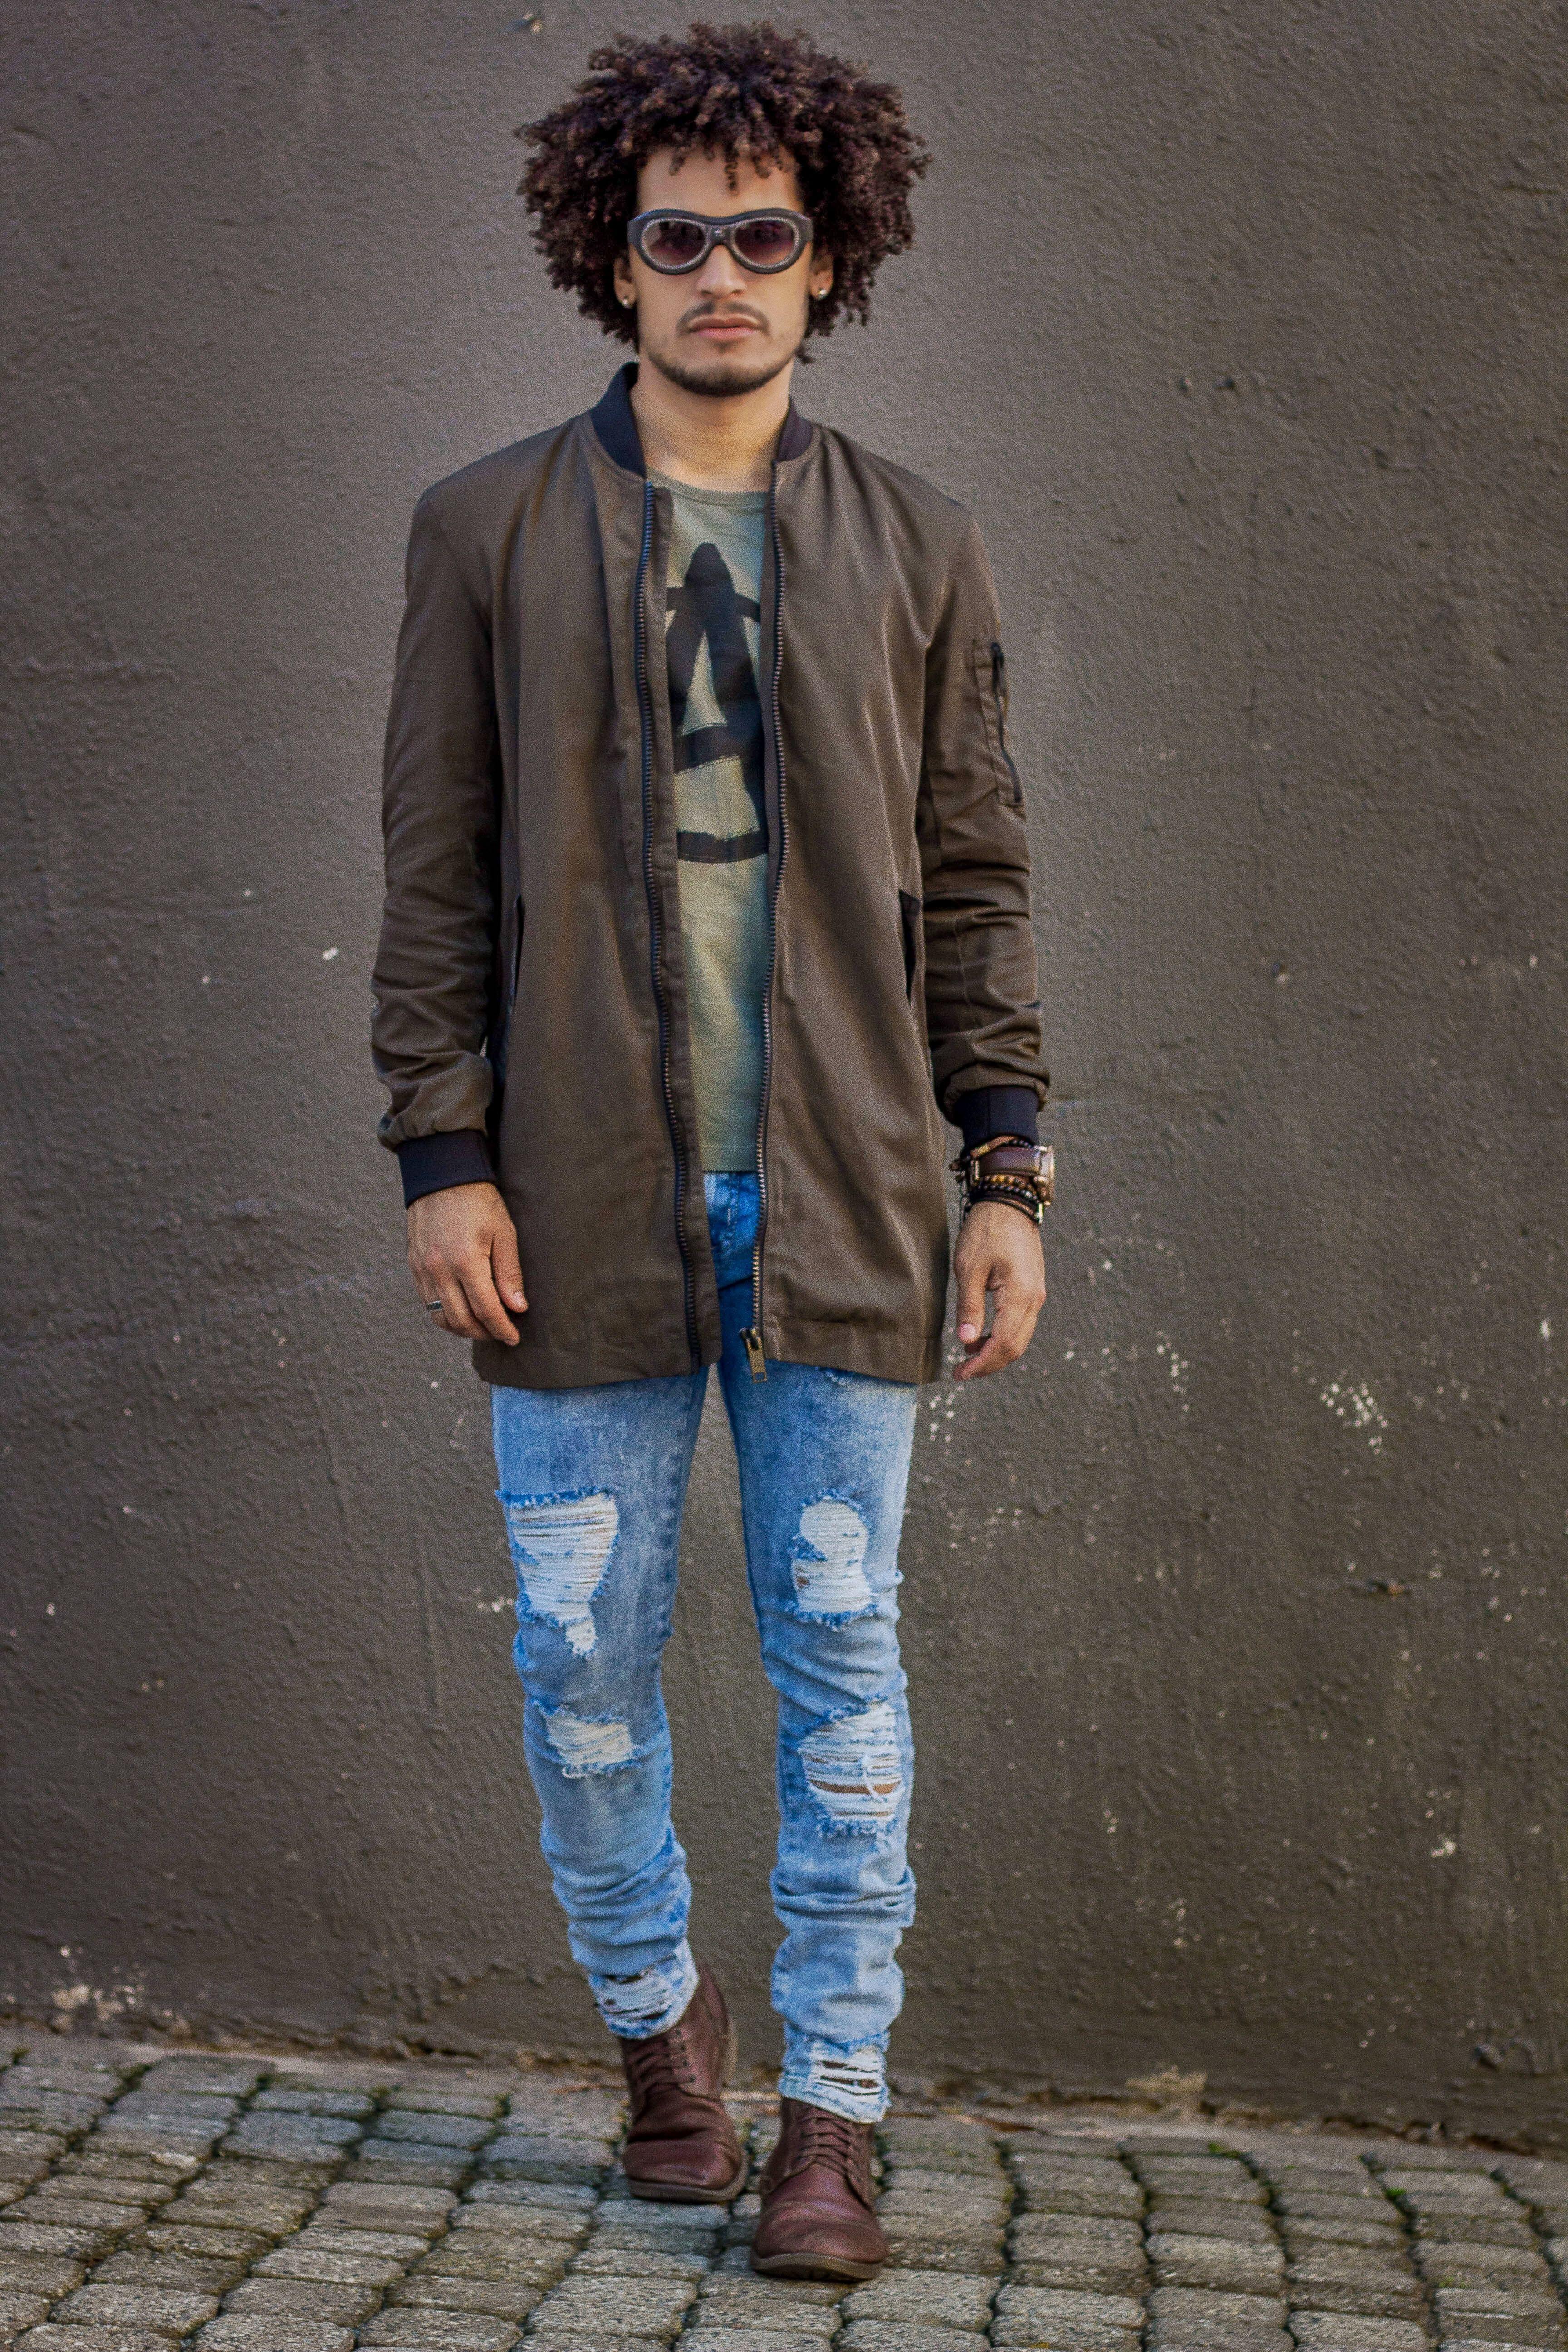 00ca0d985 Look Masculino - Jaqueta masculina verde Militar Riachuelo - Jeans Detonado  Masculino - Coturno Masculino - Street Style - Look Inverno - Men Style -  Winter ...